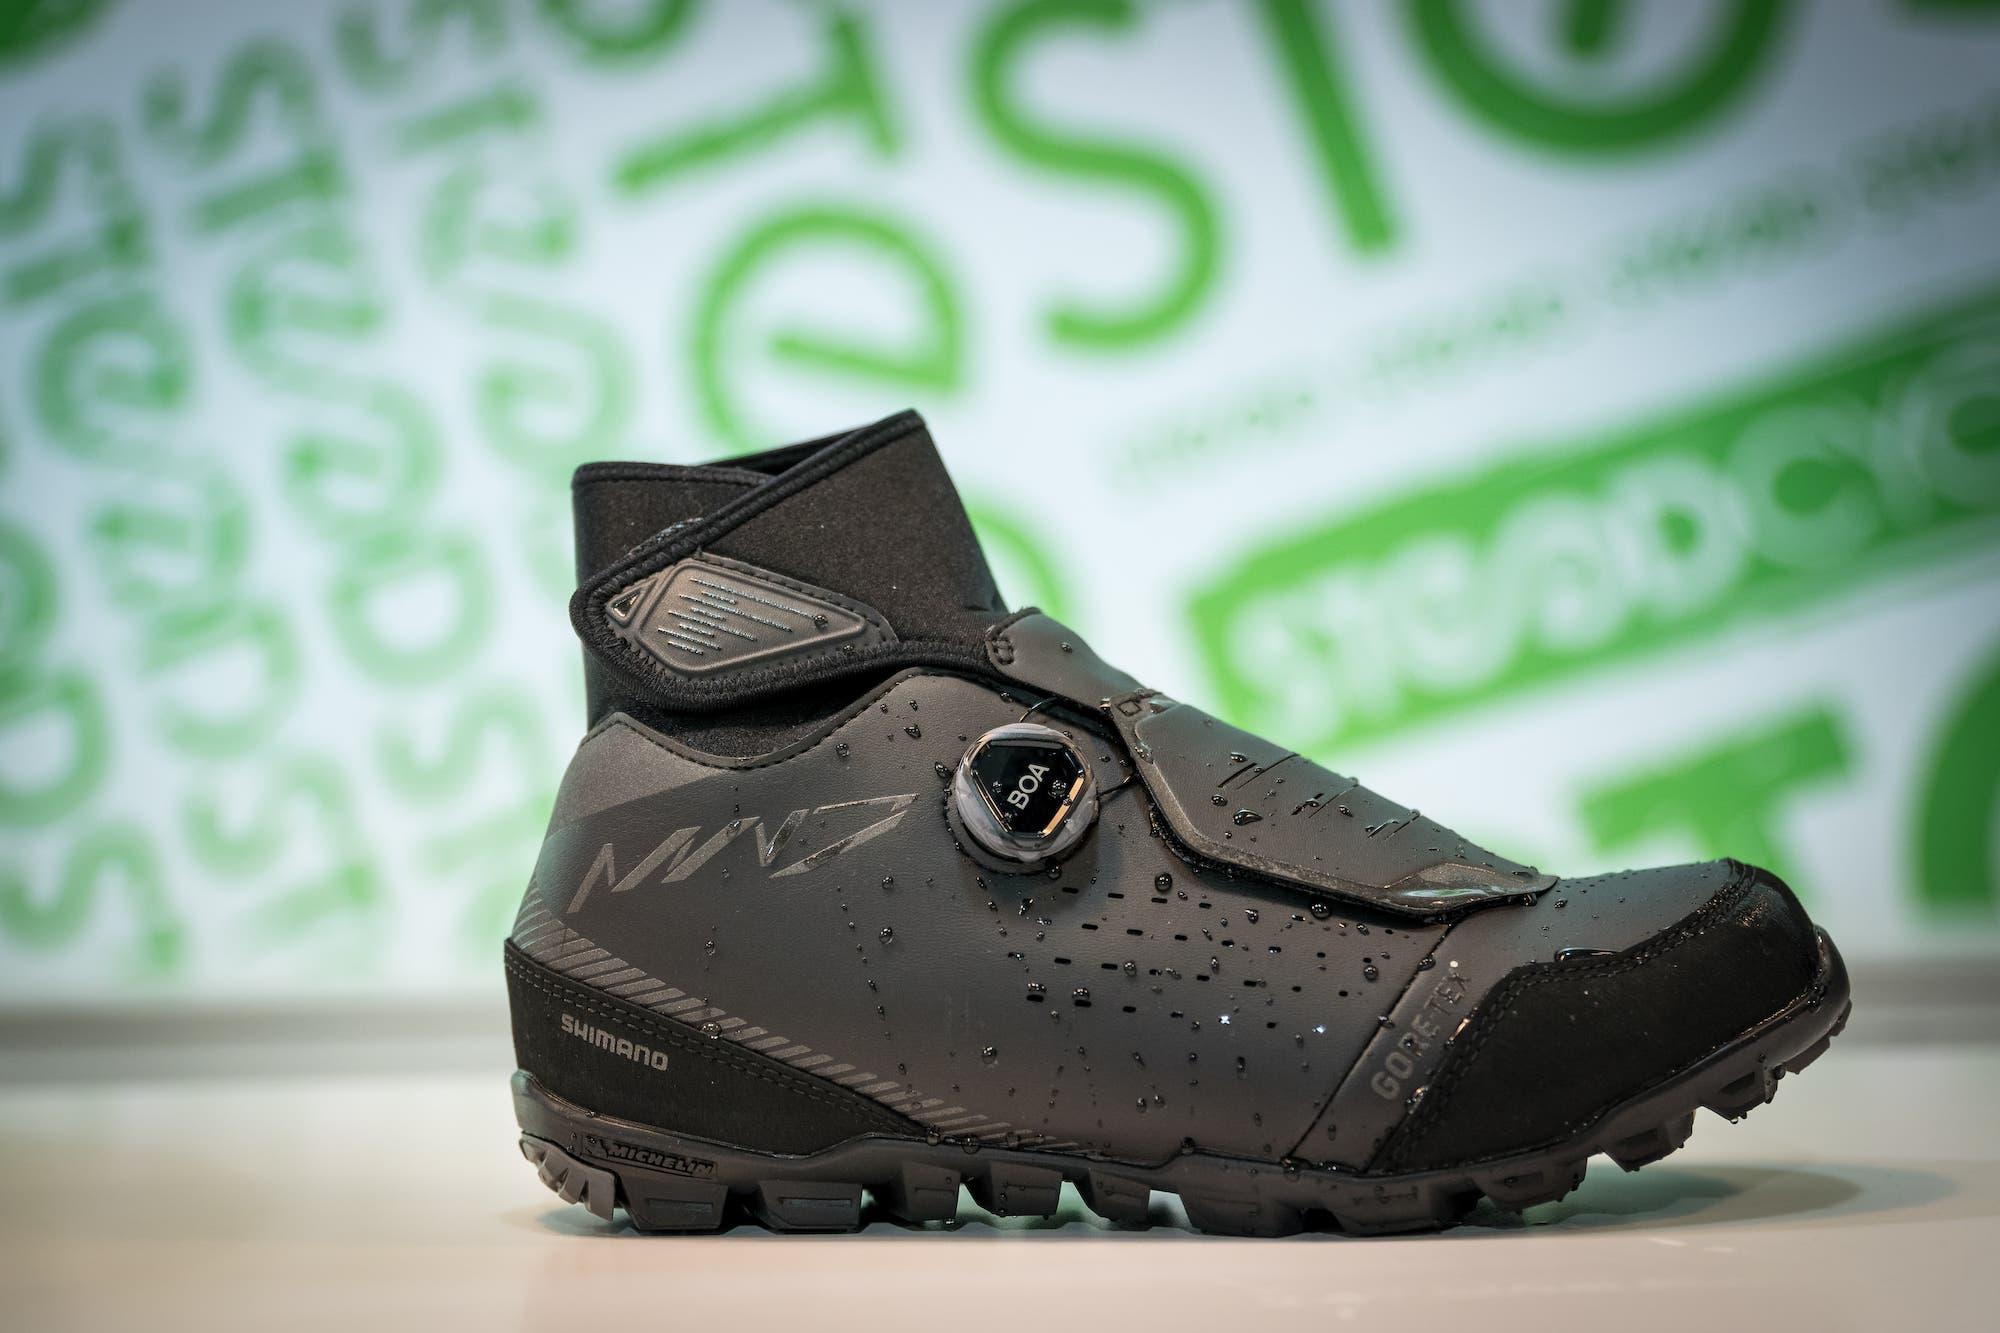 Shimano MW7 Winter Mountain Bike Shoe